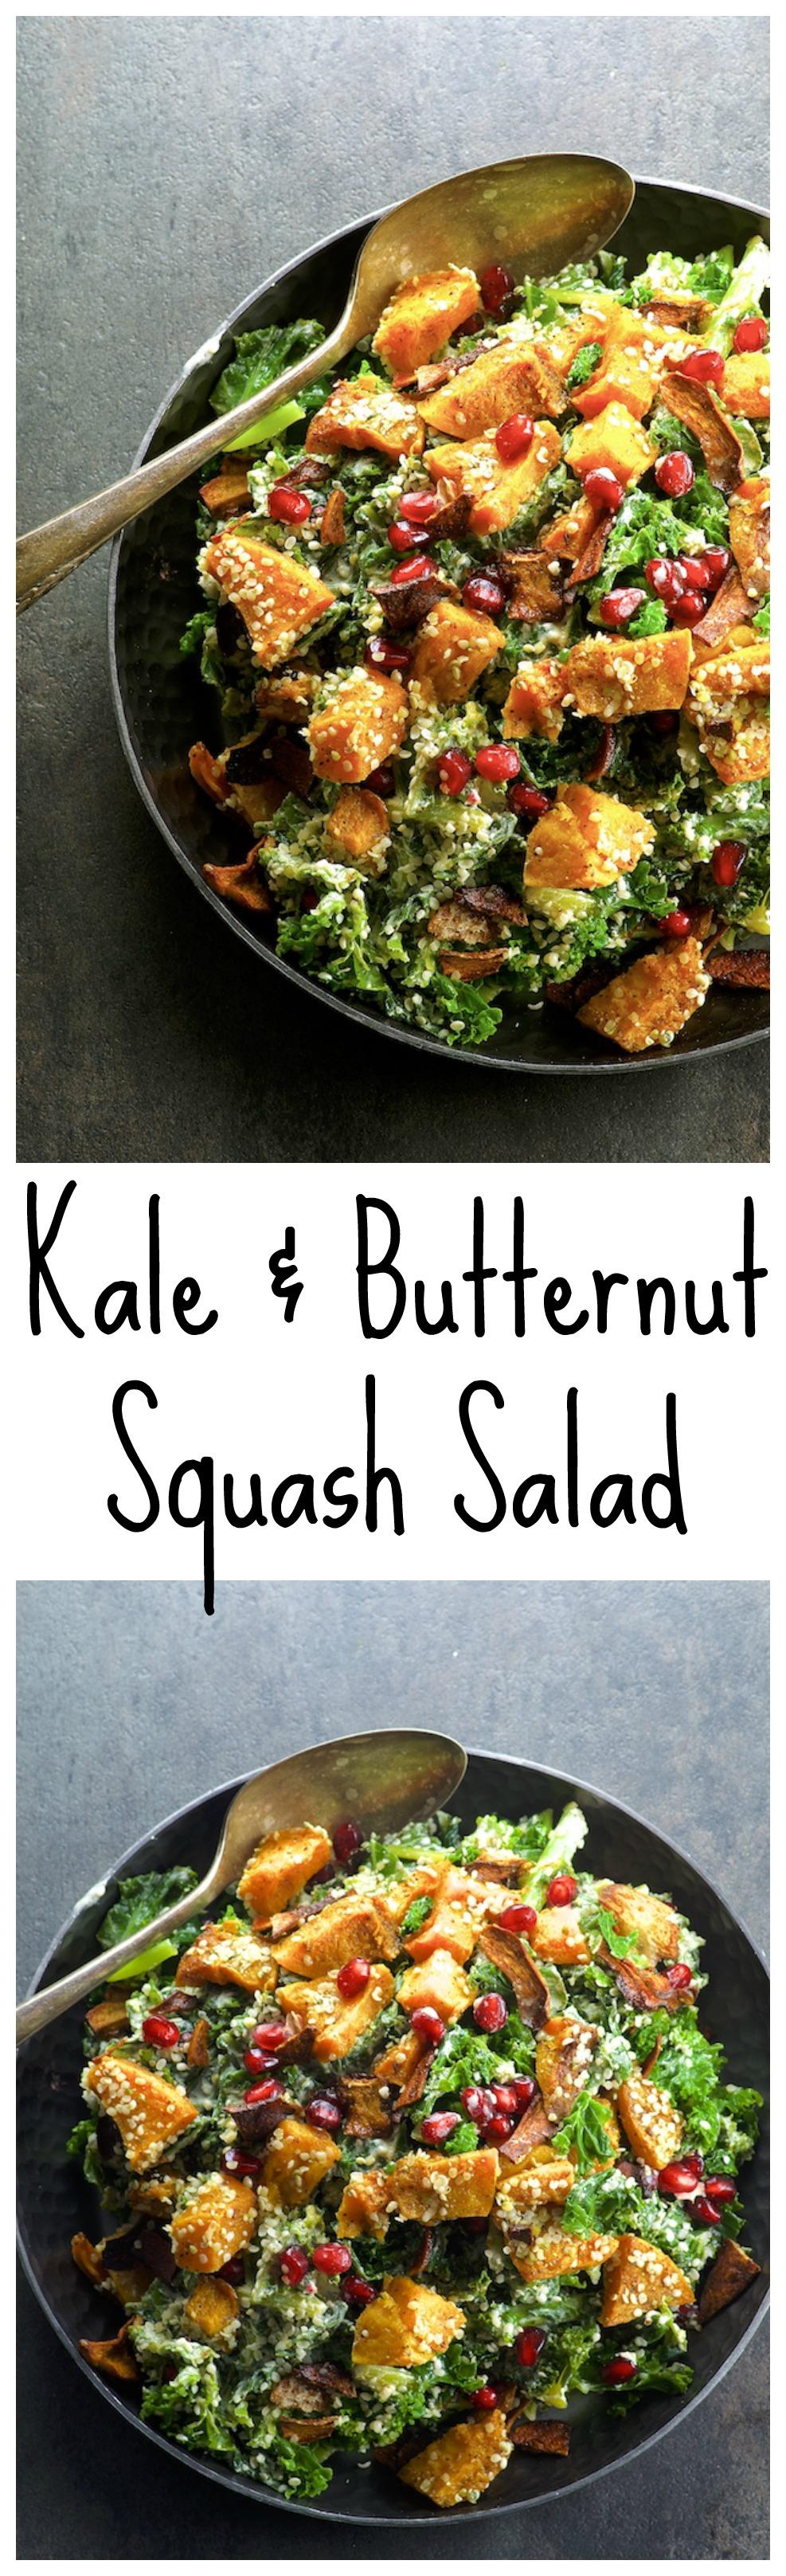 Vegan Kale Caesar Salad With Mushroom Bacon Bits and Pomegranates